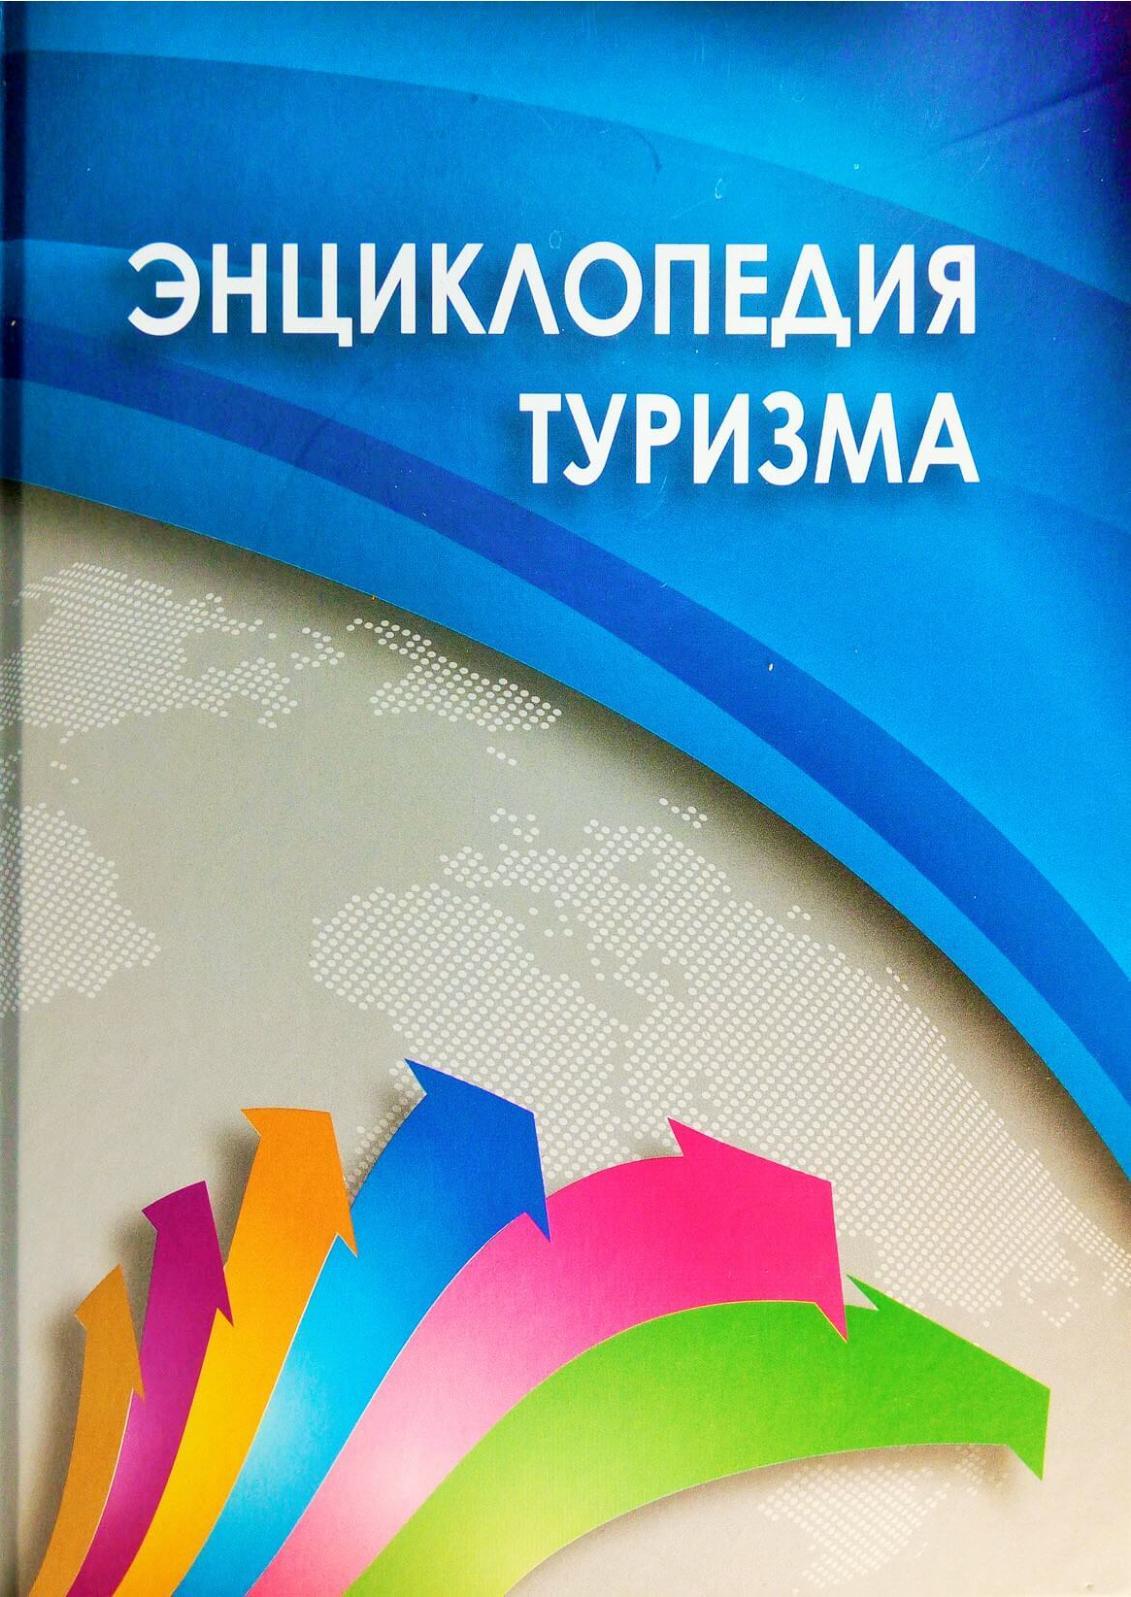 97d9b642616b Calaméo - Энциклопедия туризма